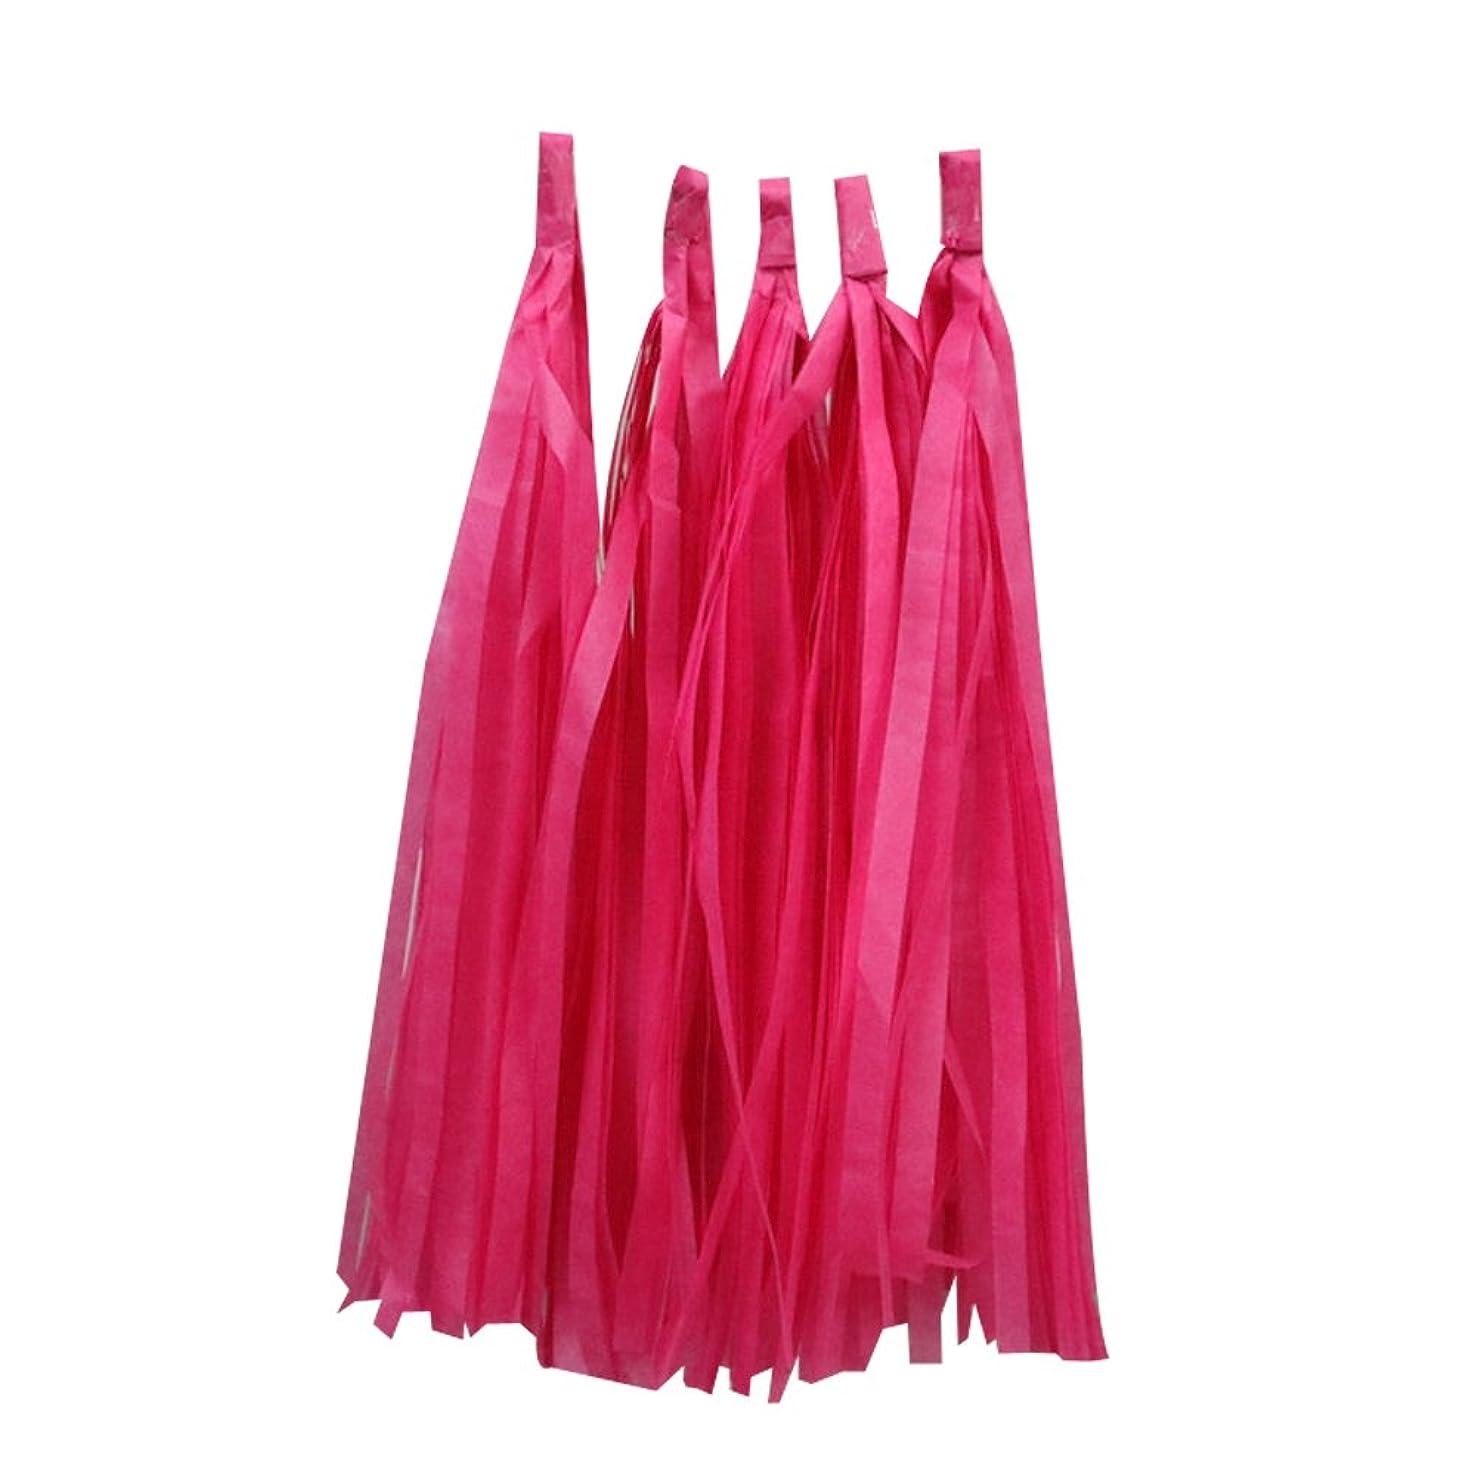 Estyle Fashion 10PCS Birthday Tissue Paper Tassel Garland for Baby Shower Party Wedding Decoration (Rose Red)